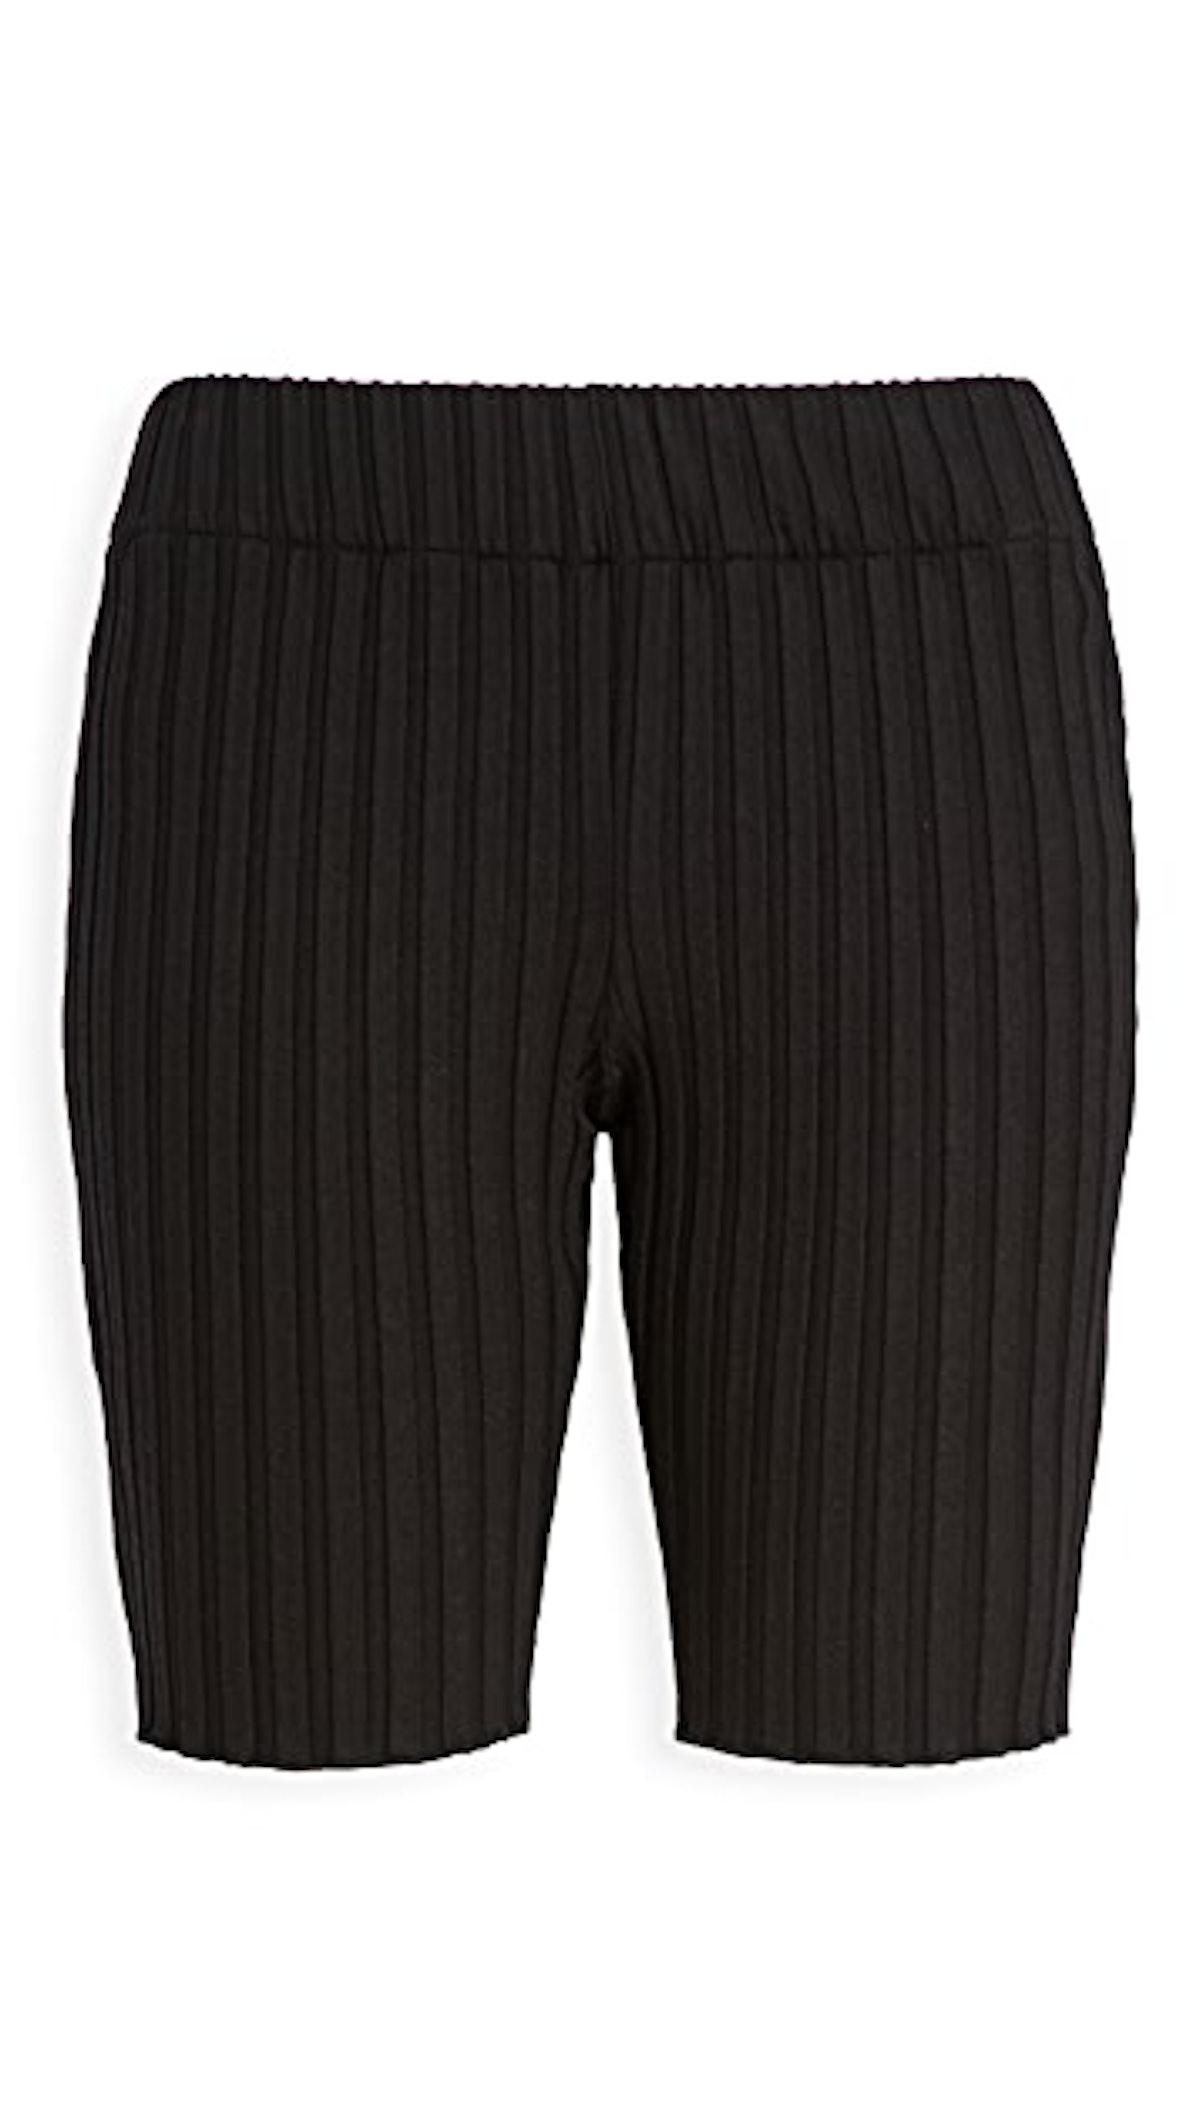 Burr Bike Shorts